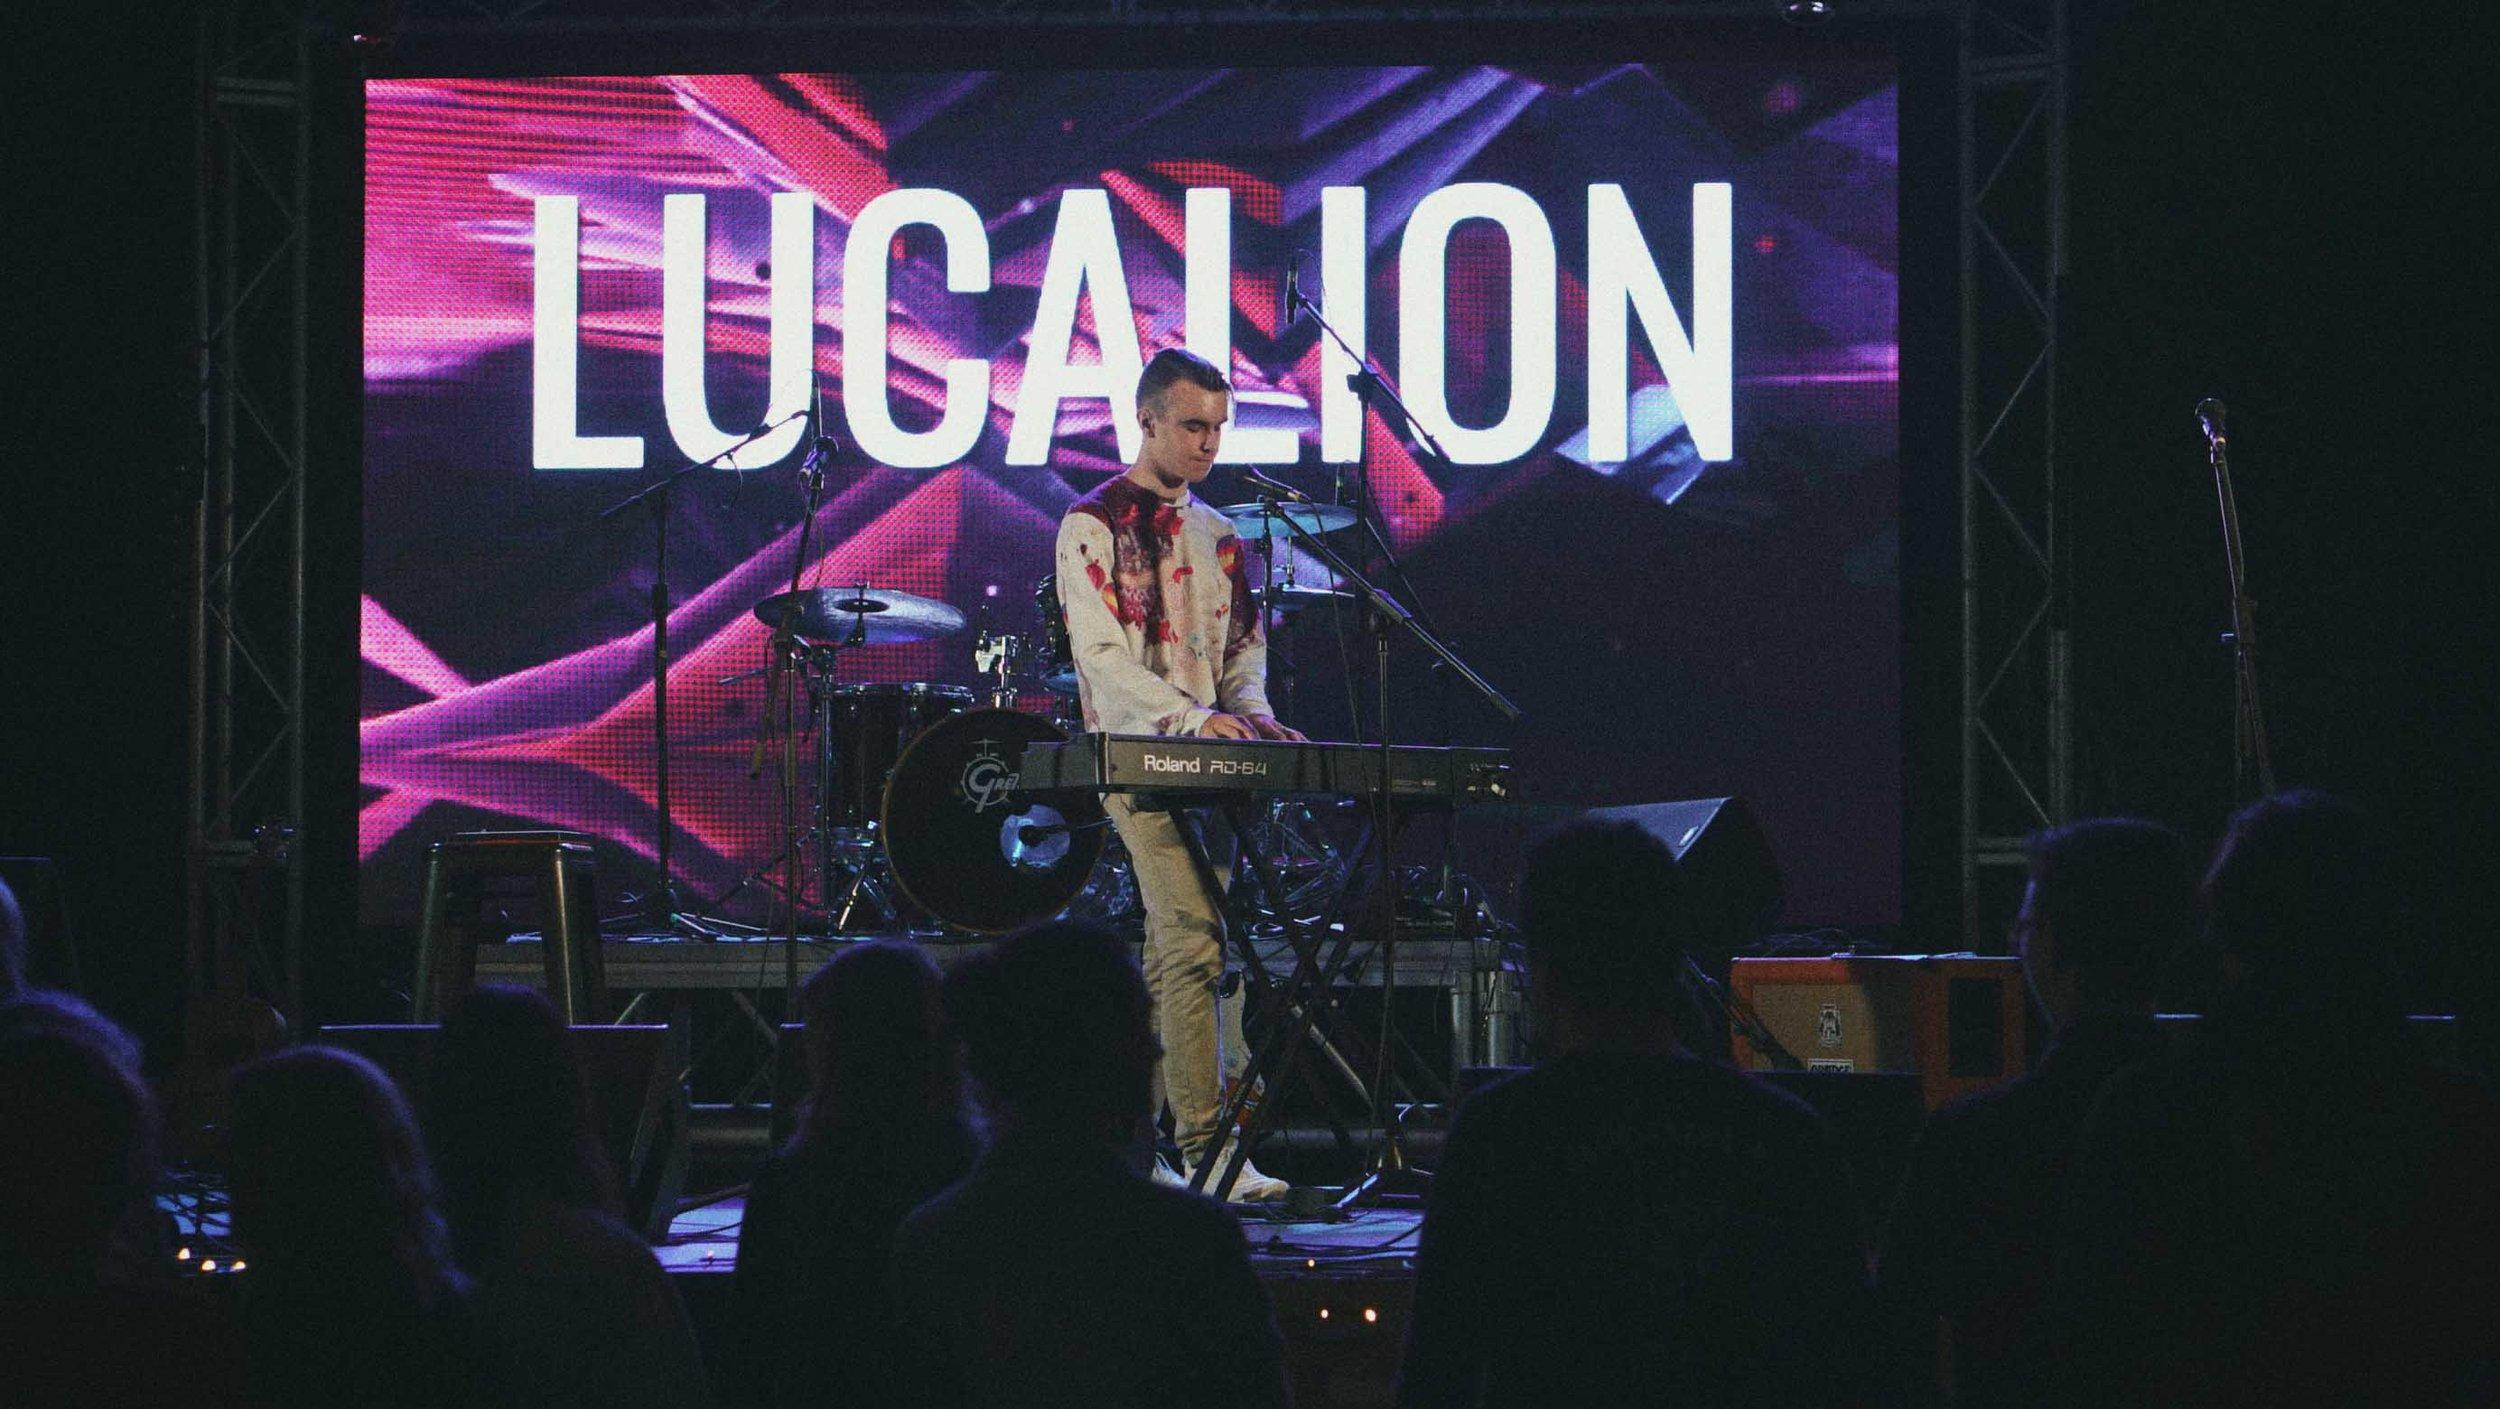 Lucalion-2